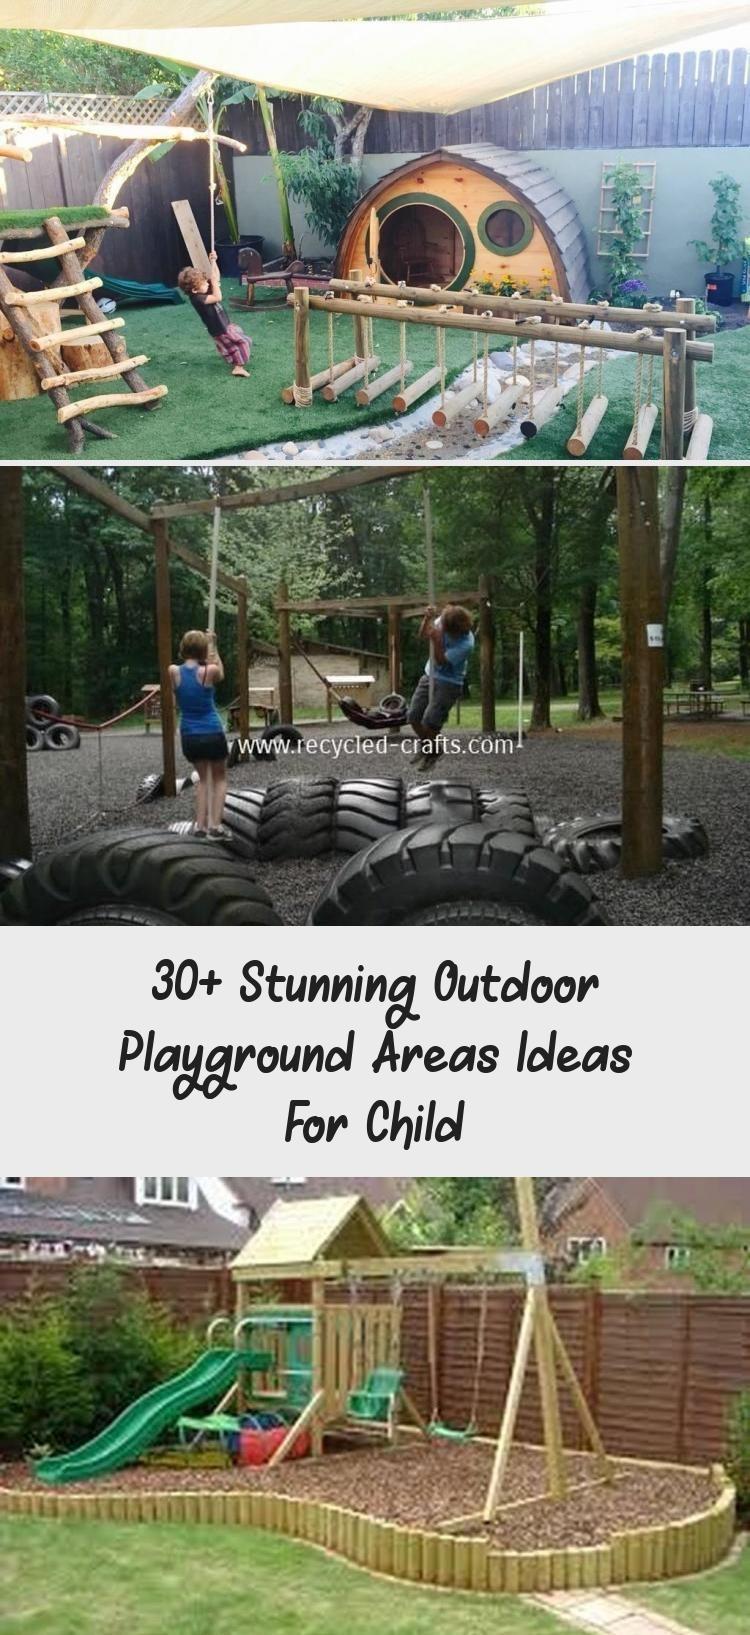 30 Stunning Outdoor Playground Areas Ideas For Child Areas Child Ideas Naturalplaygrou Playground Areas Outdoor Playground Outdoor Play Areas